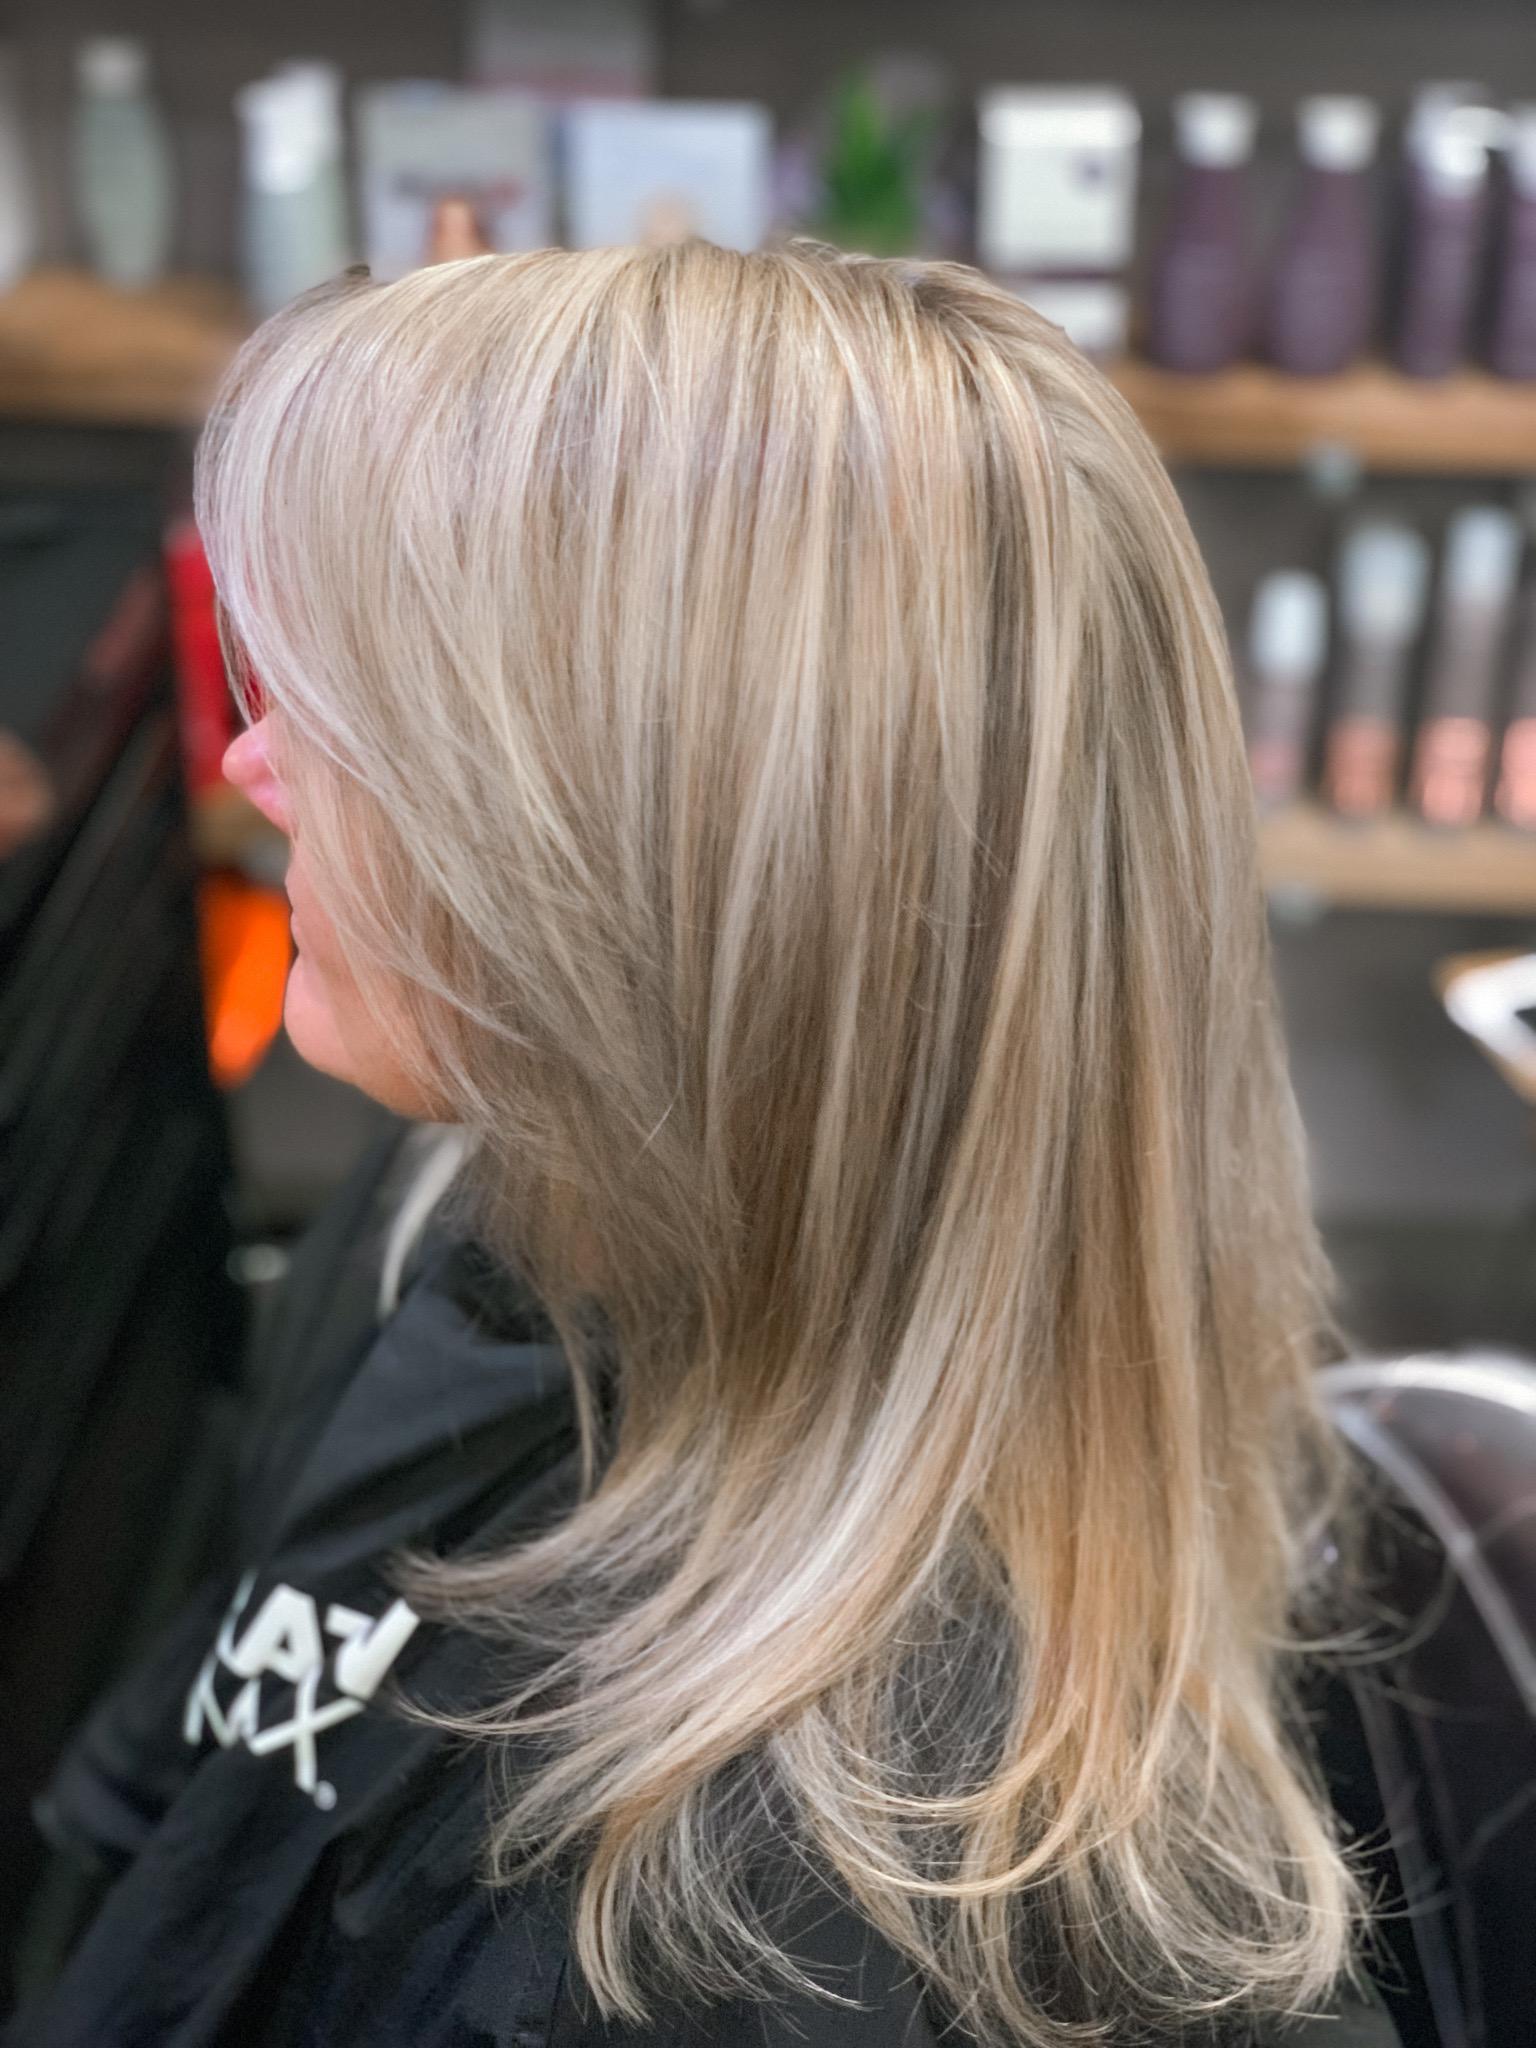 Simply Colour Hair Salon Studio by Dean Downing